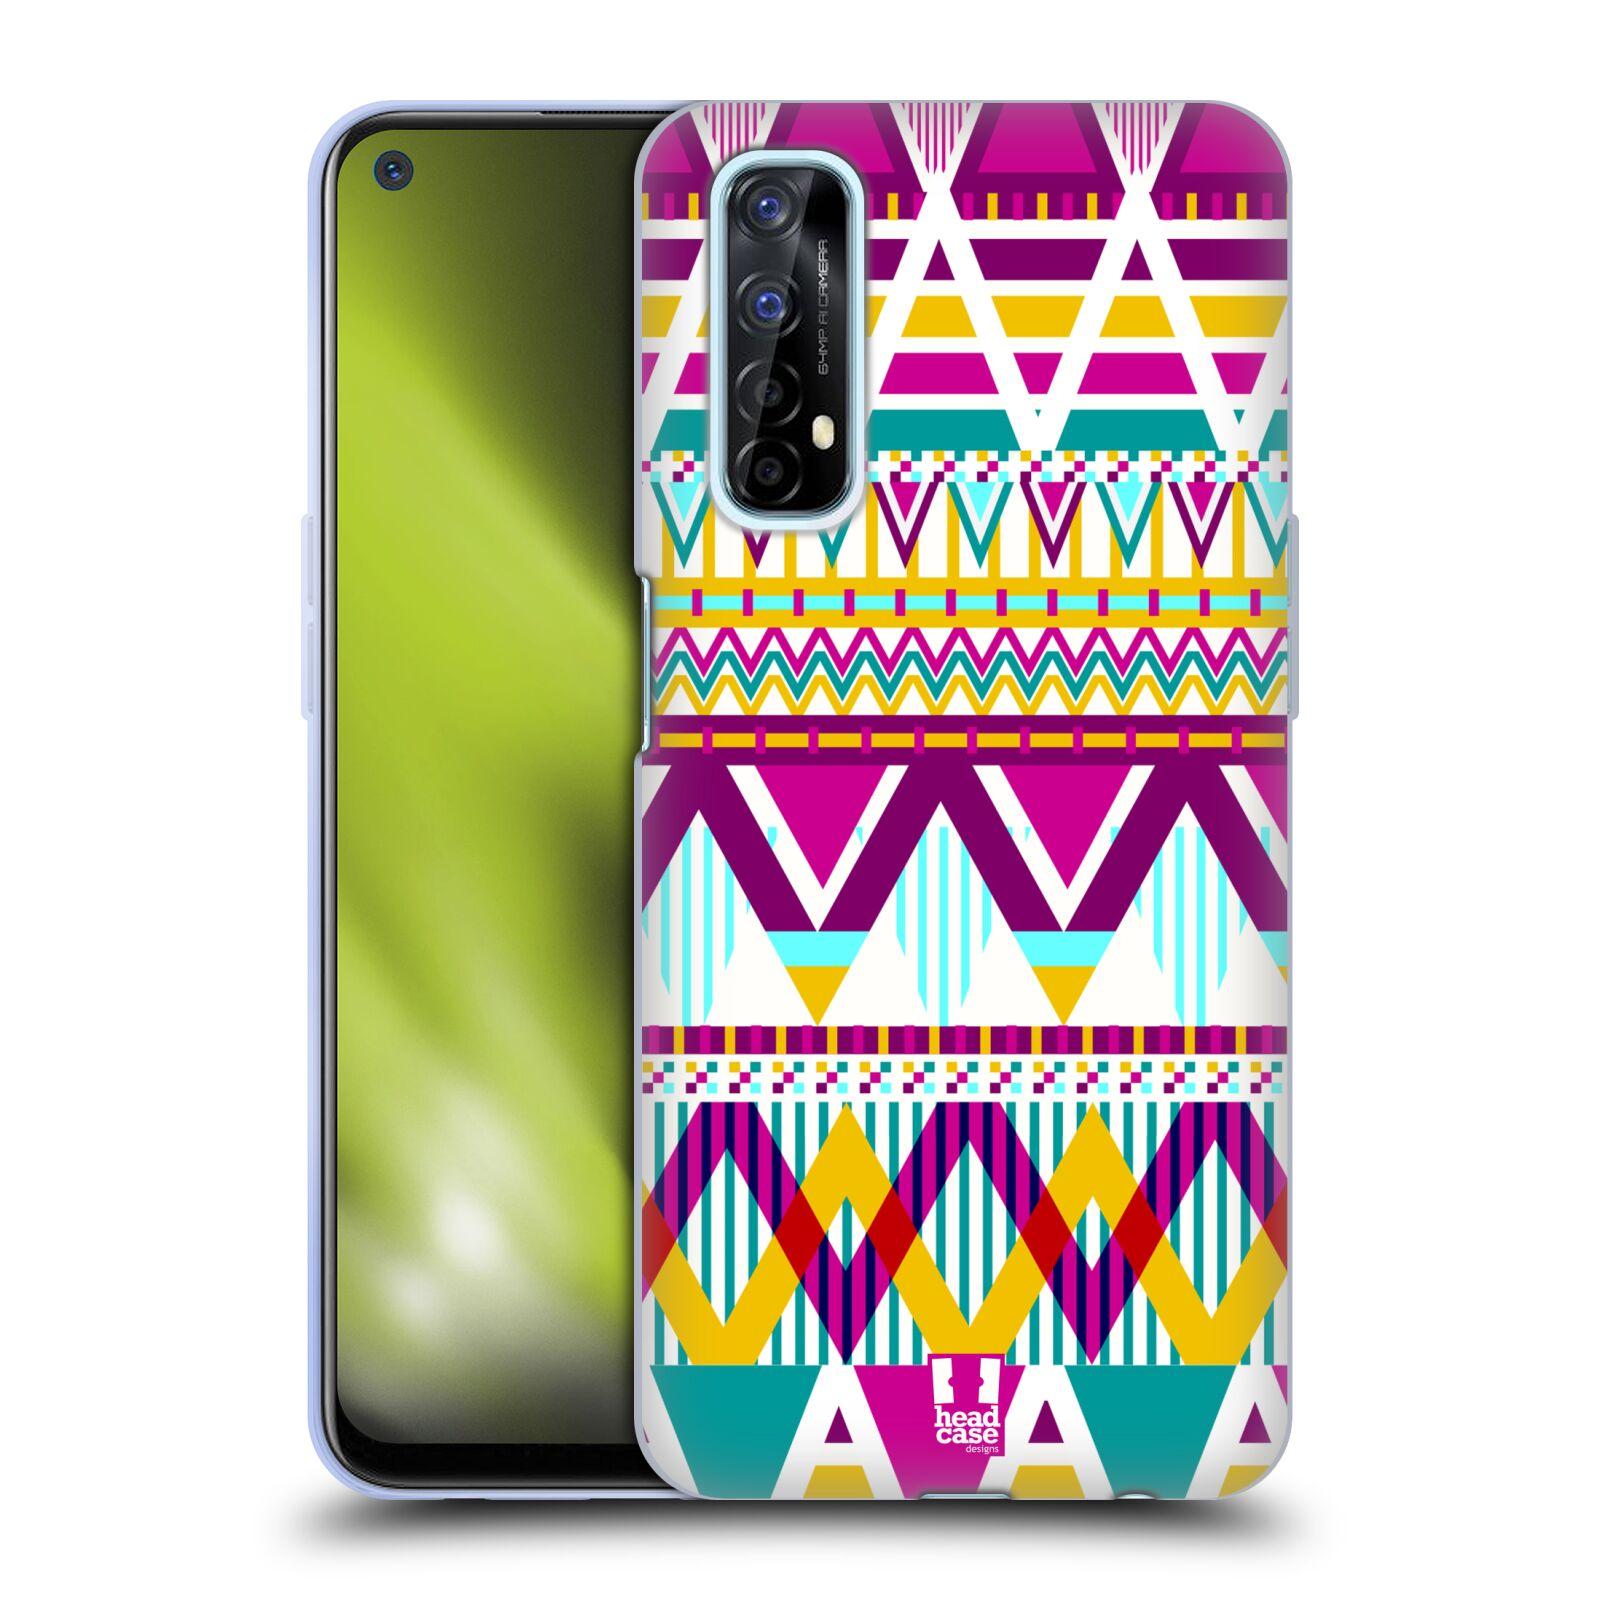 Silikonové pouzdro na mobil Realme 7 - Head Case - AZTEC SUGARED